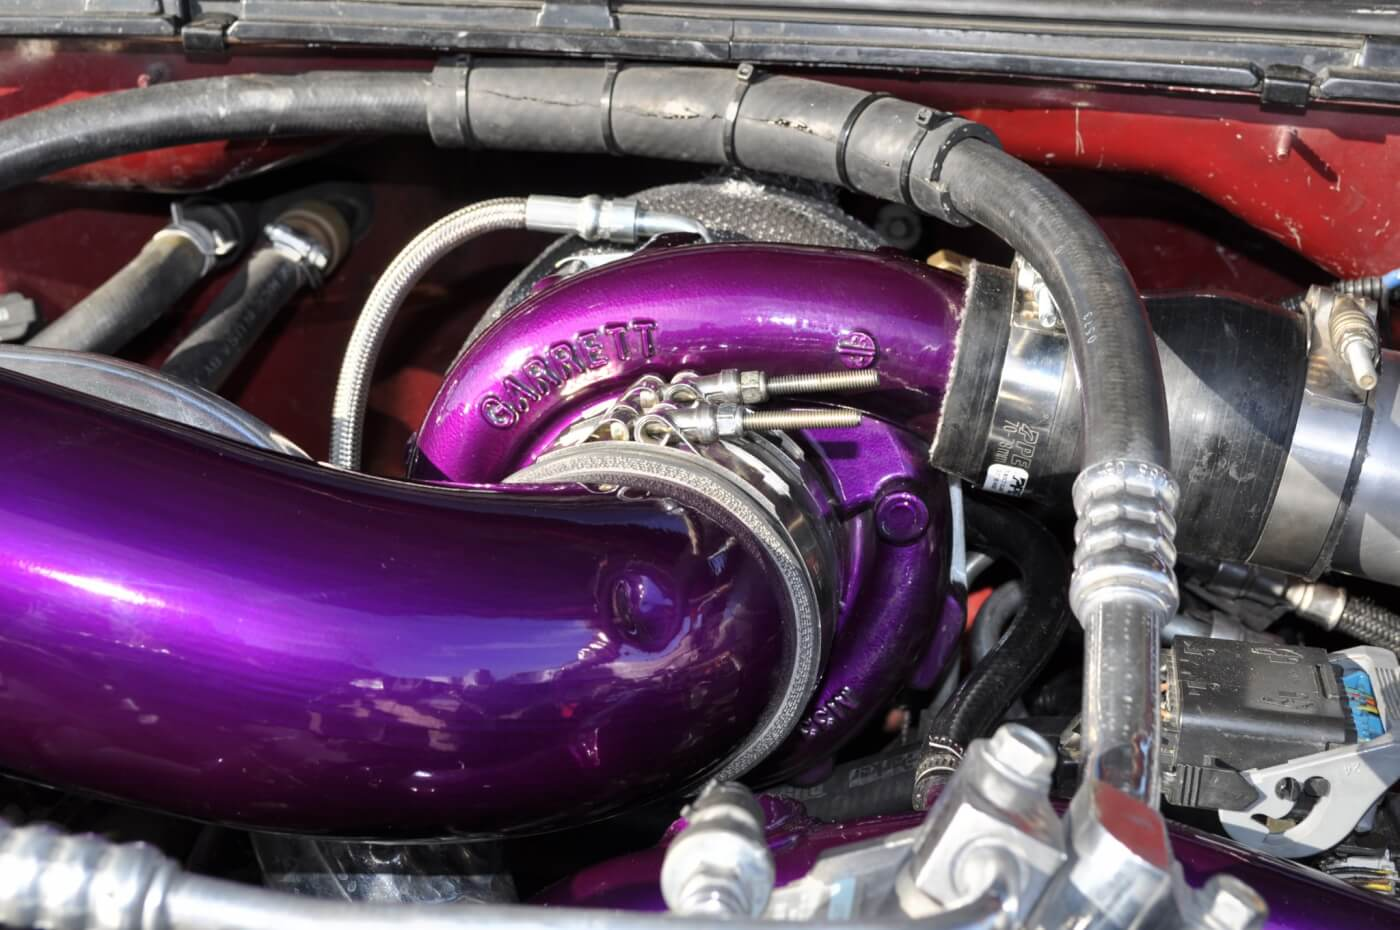 Turbocharging 101: A History of the Modern Diesel Turbocharger